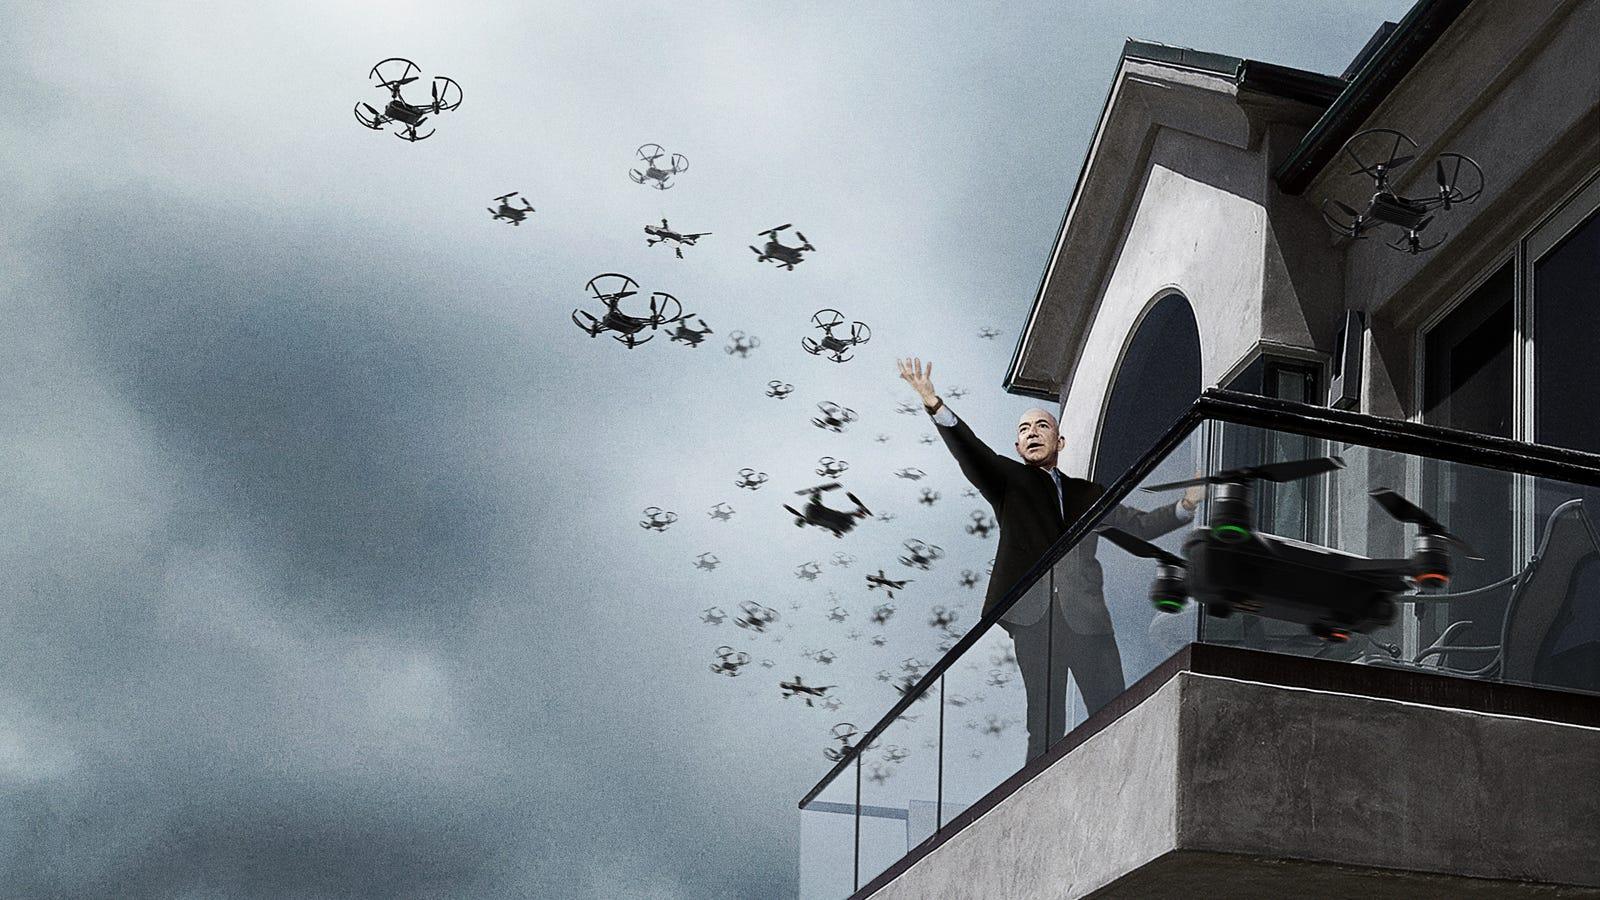 'Fly, My Pretties,' Says Jeff Bezos Releasing Swarm Of Amazon Drones To Hunt Down Nude Photos